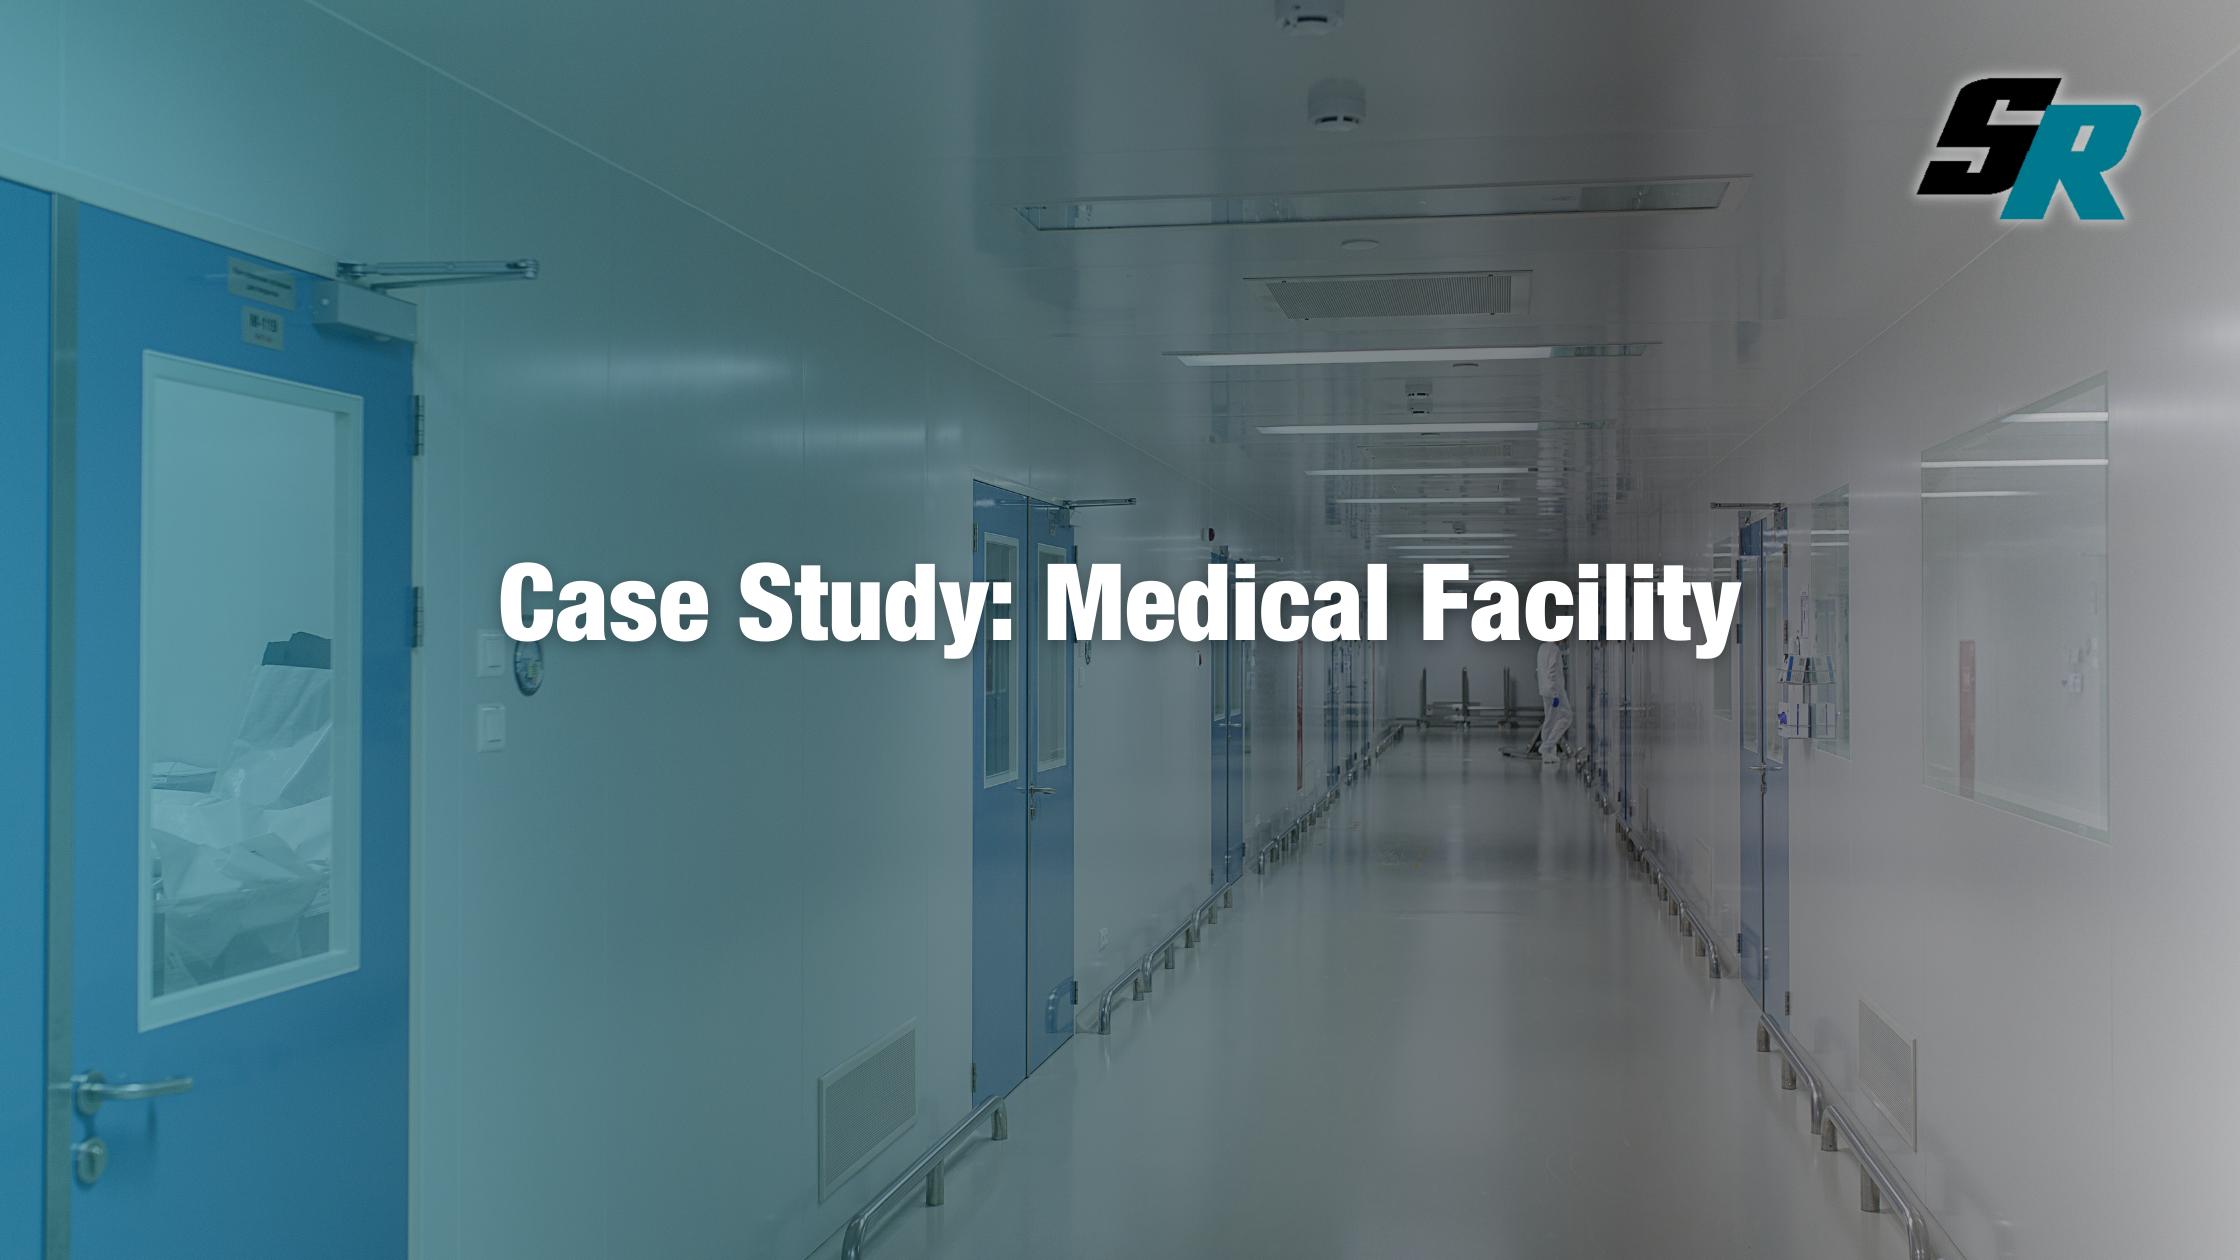 A Sasser Restoration Case Study Involving a Medical Facility